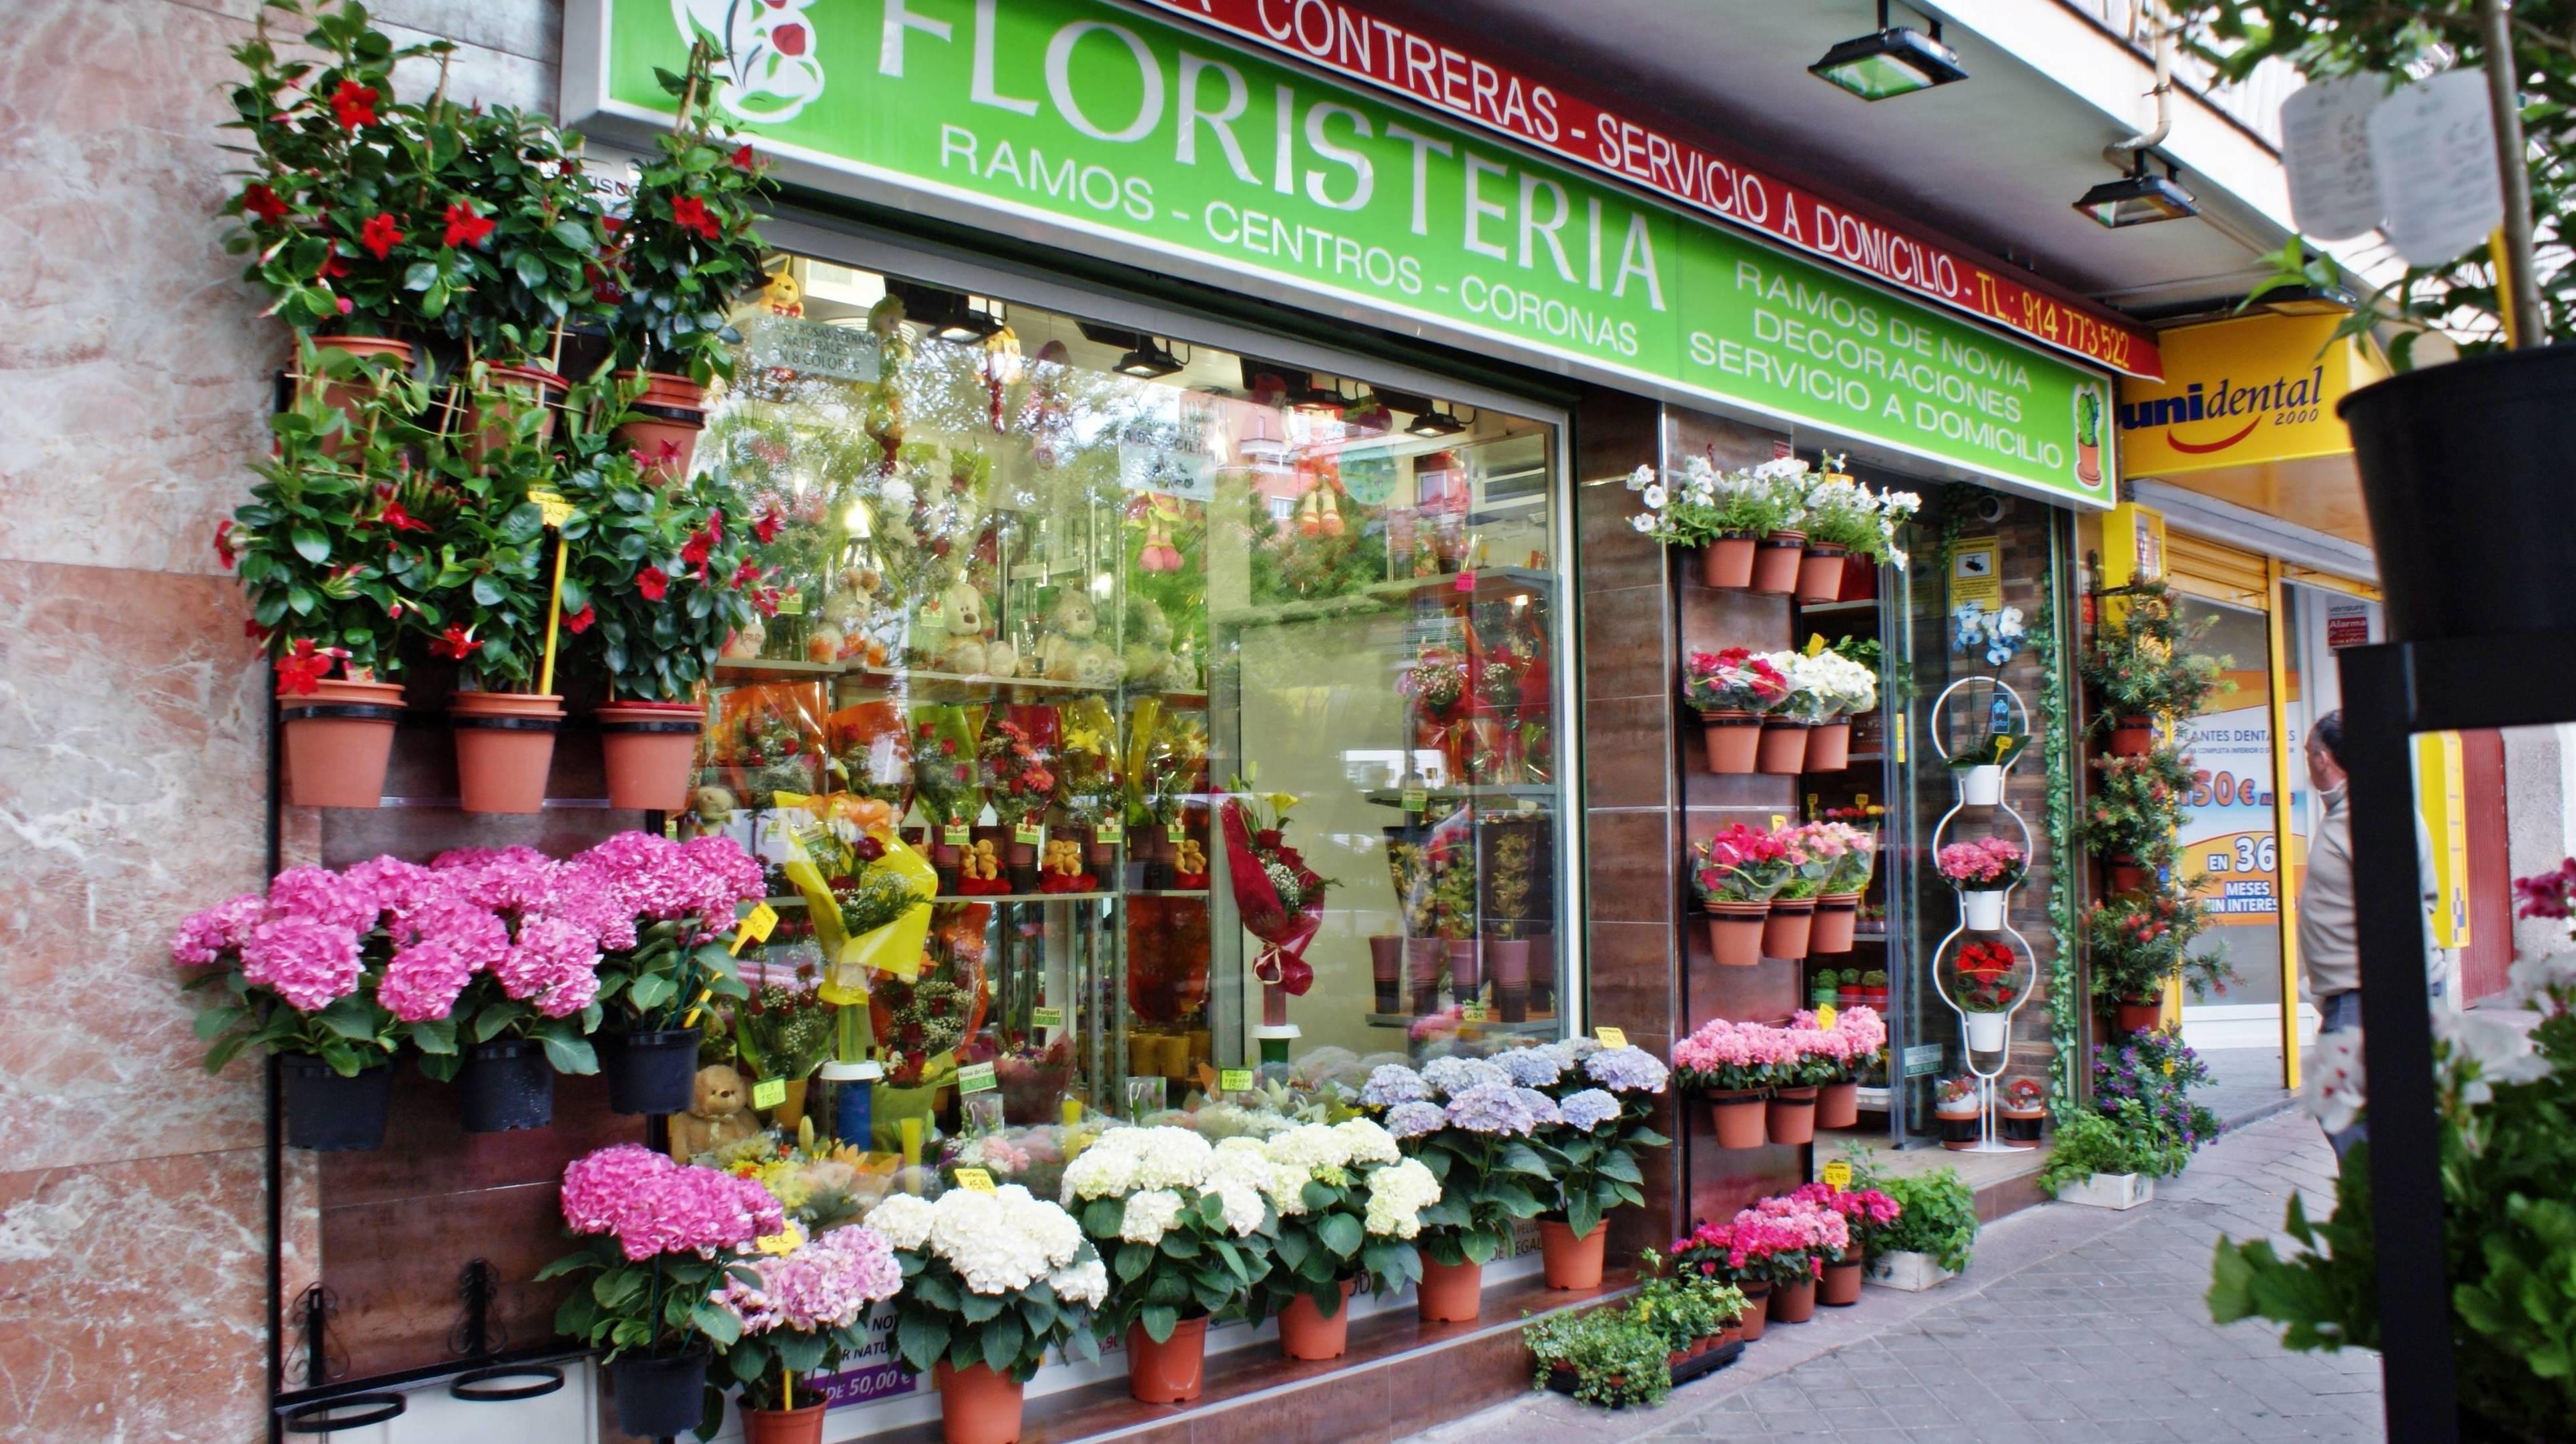 Foto 69 de Floristerías en Madrid | Floristería Contreras